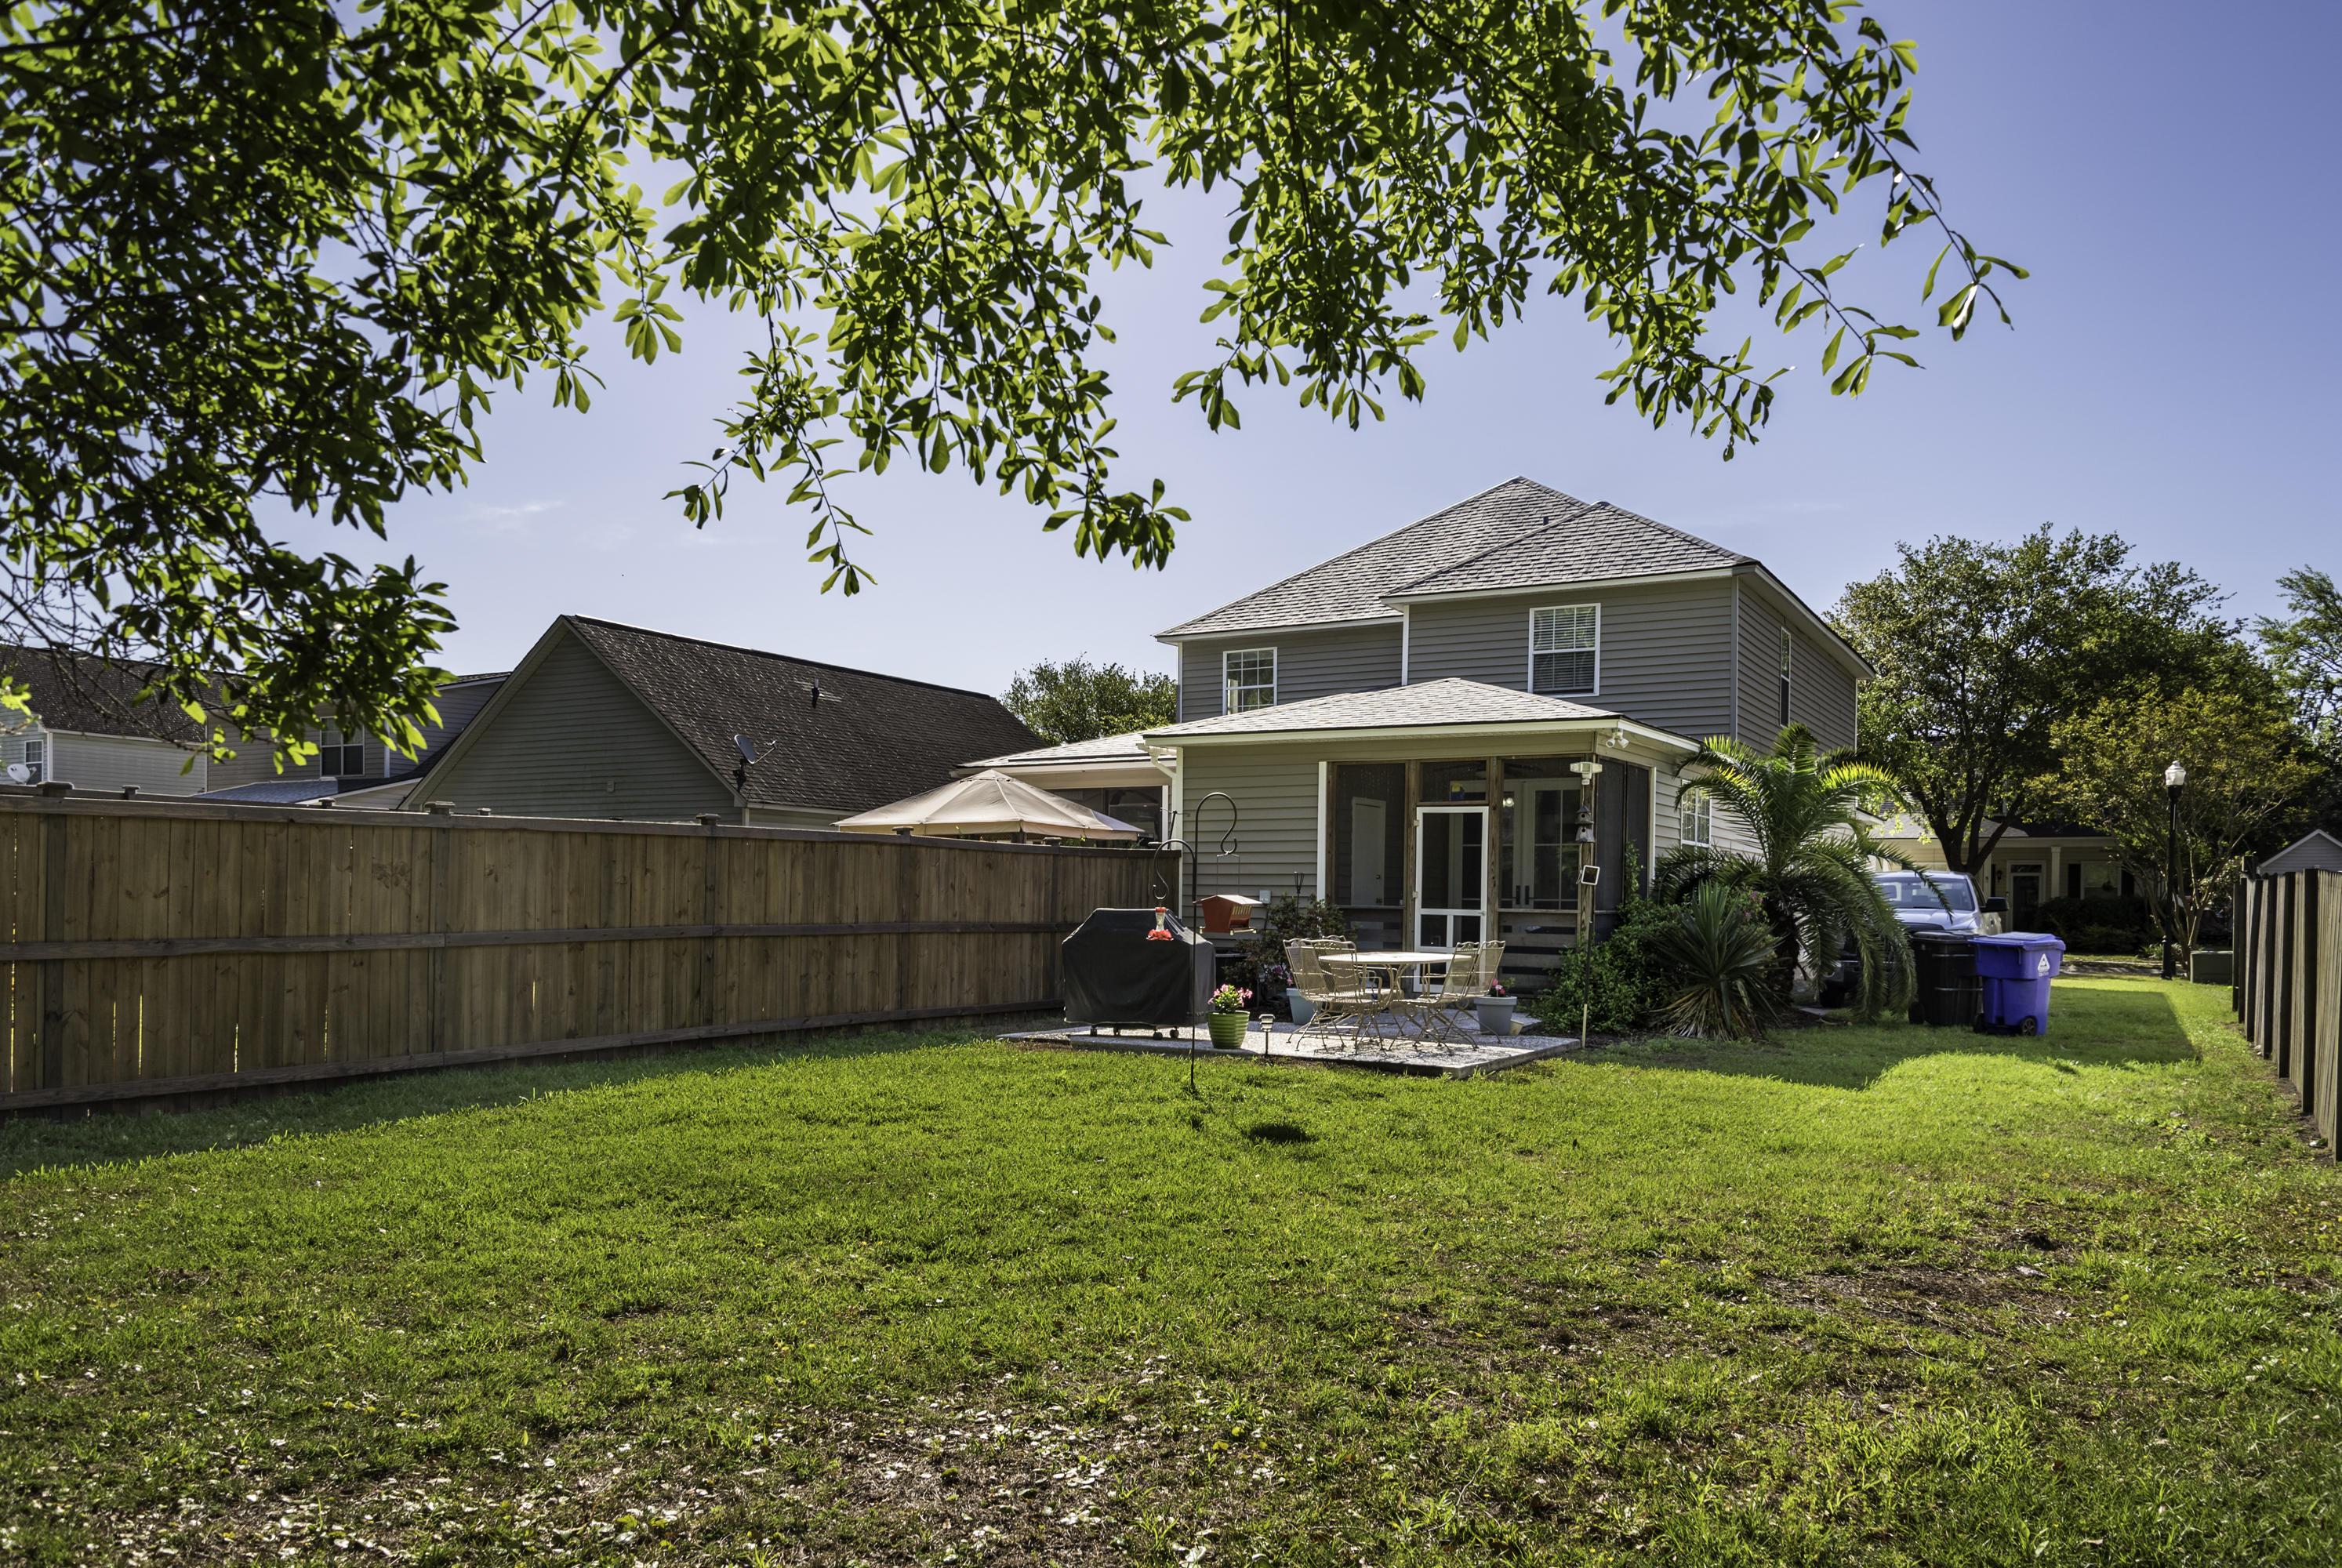 Chadbury Village Homes For Sale - 2333 Chadbury, Mount Pleasant, SC - 13